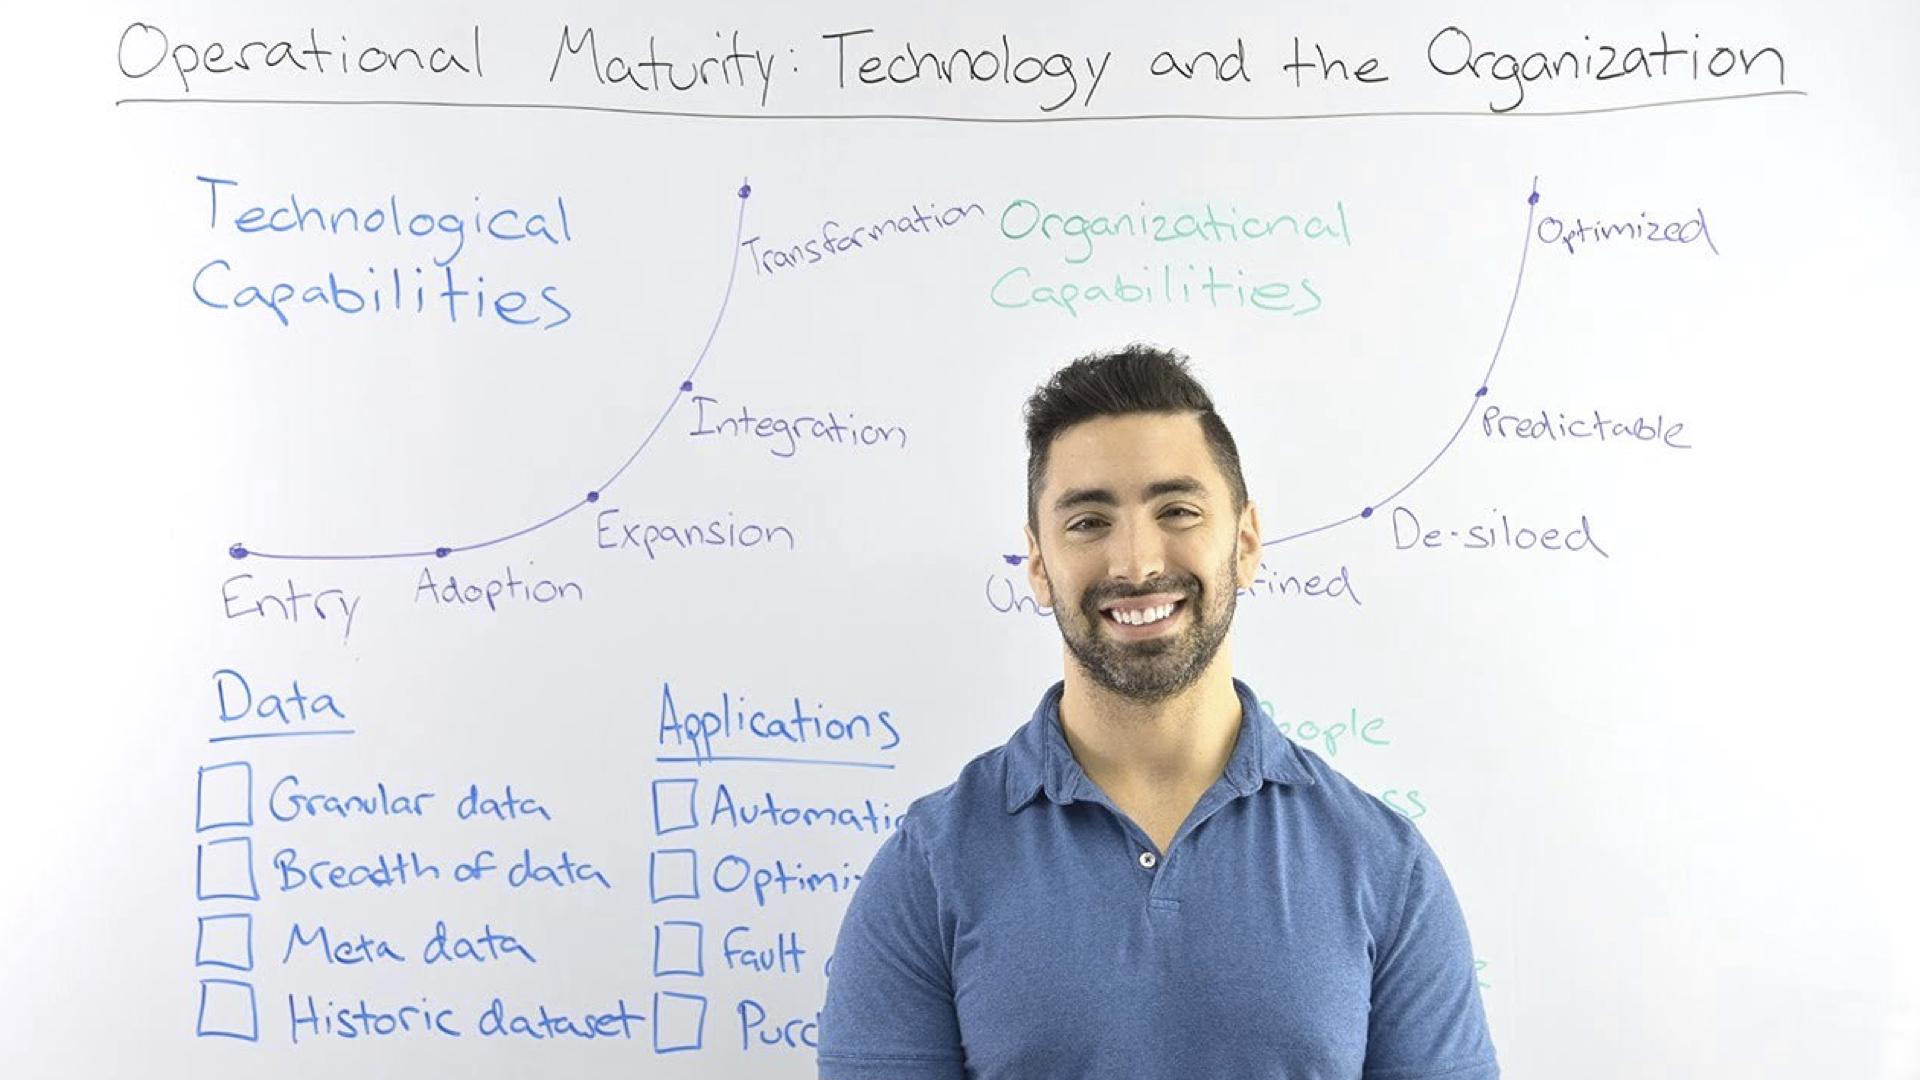 10. Operational Maturity: Technology and the Organization